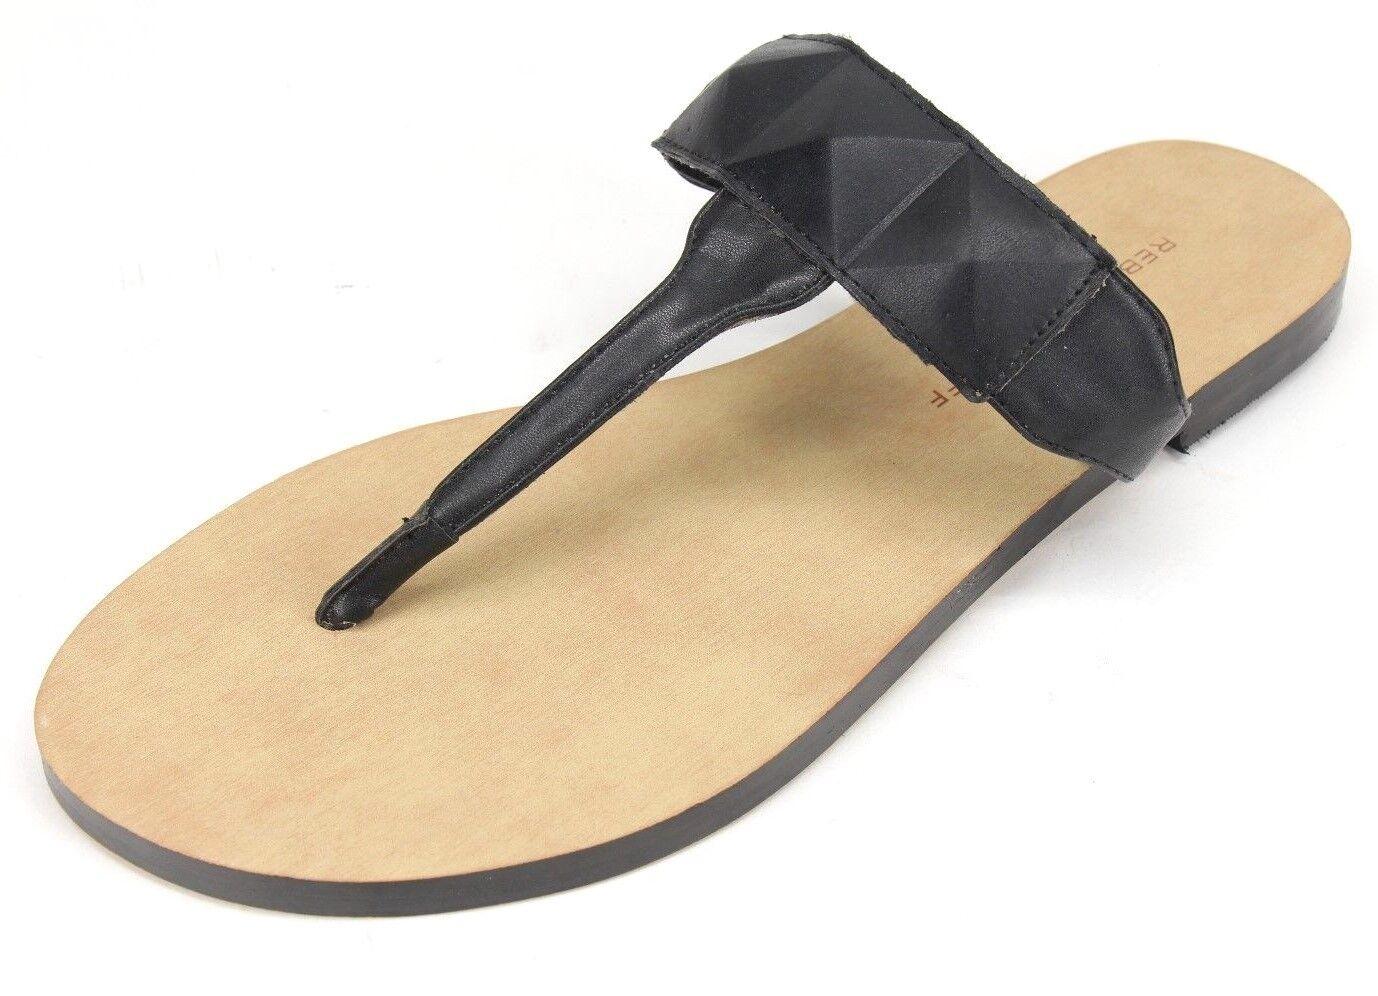 Rebecca Minkoff Eloise Black Leather Flip Flop Sandal Pyramid Strap Size US 7 M